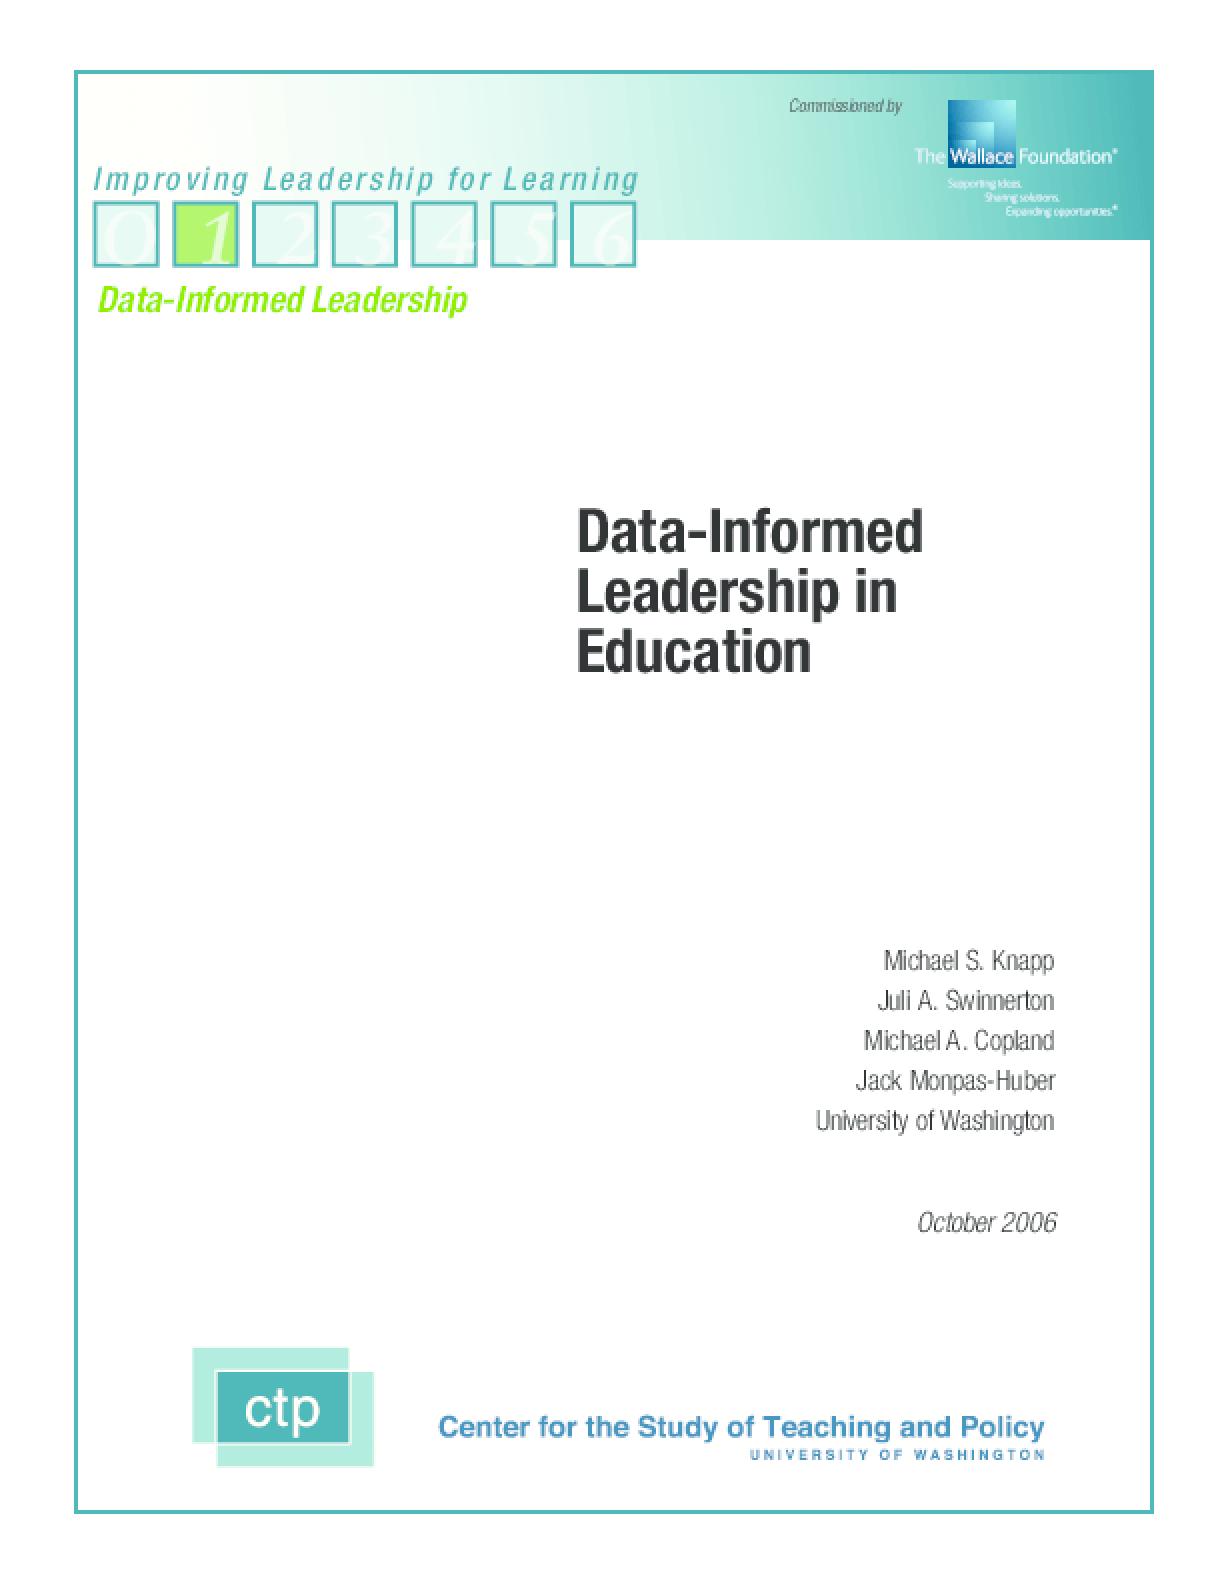 Data-Informed Leadership in Education